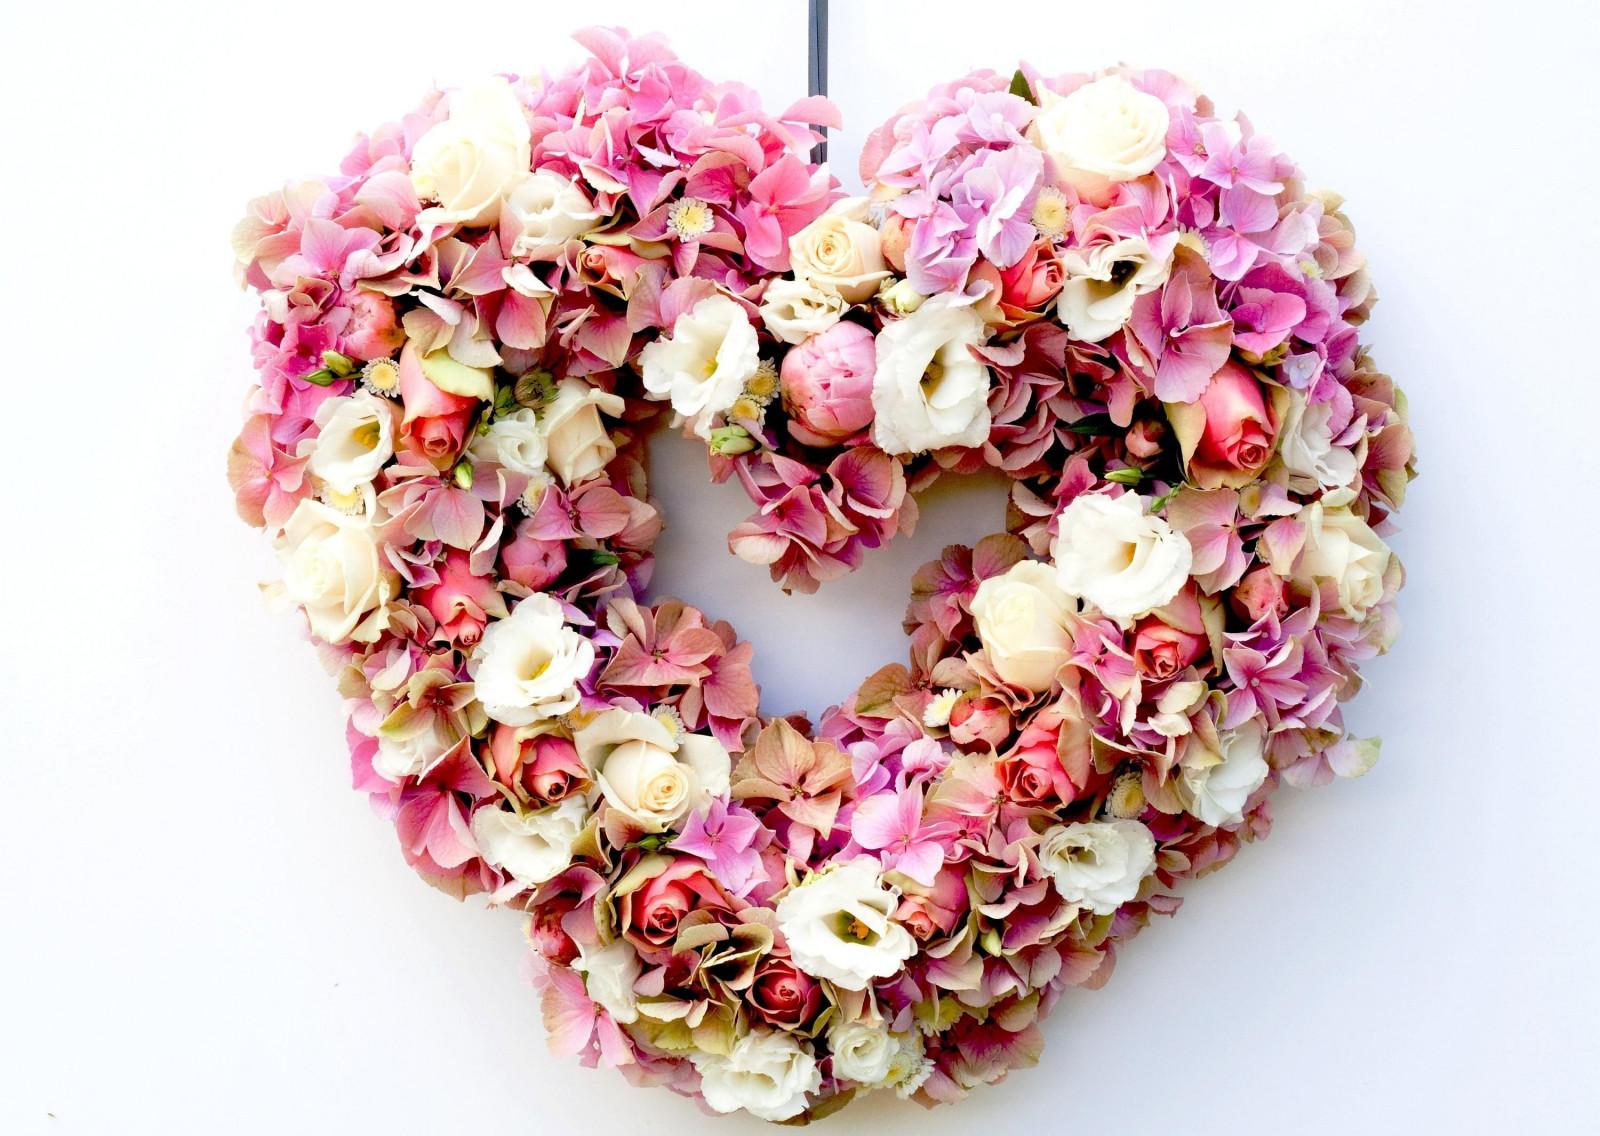 Фото дети, картинки сердце с цветами